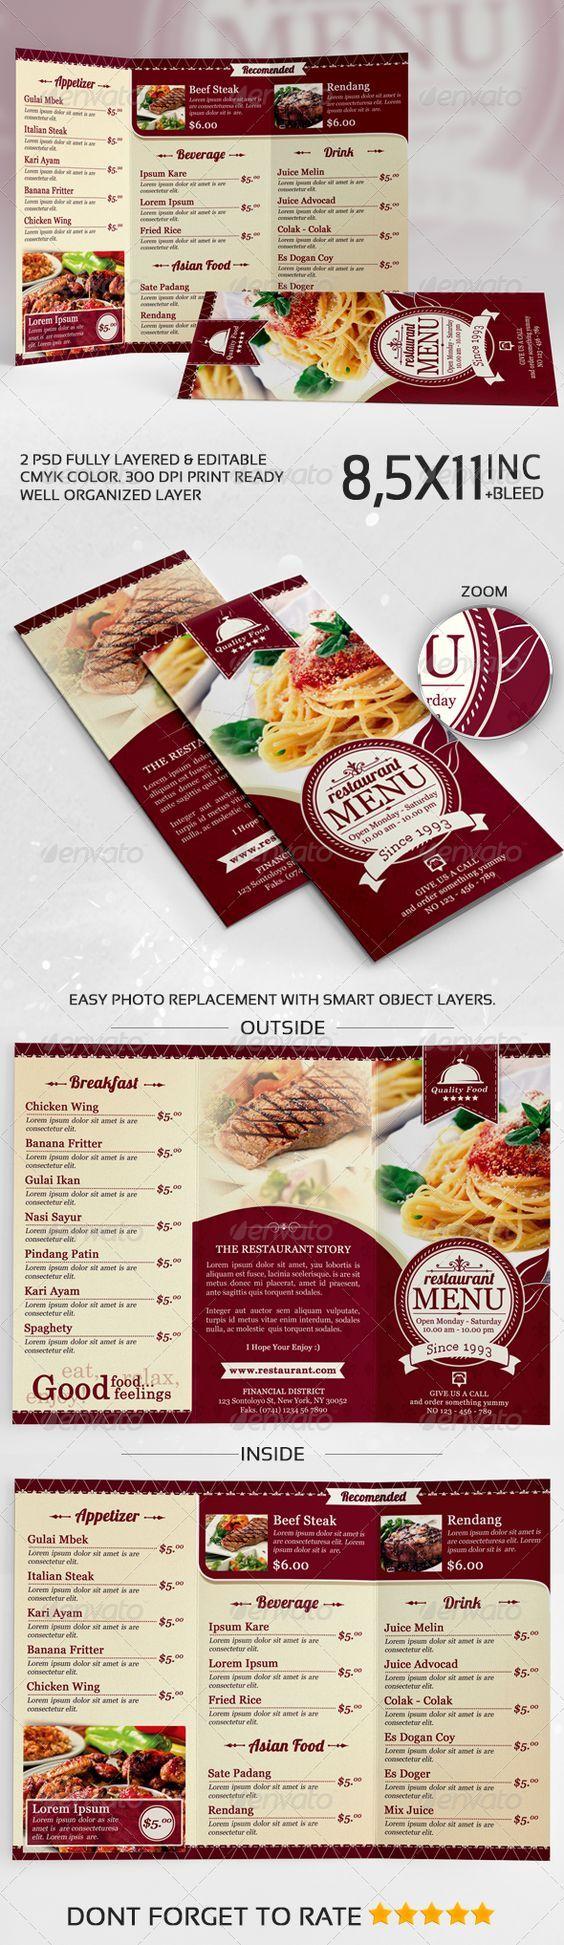 196 best Дизайн Меню images on Pinterest | Restaurant menu design ...